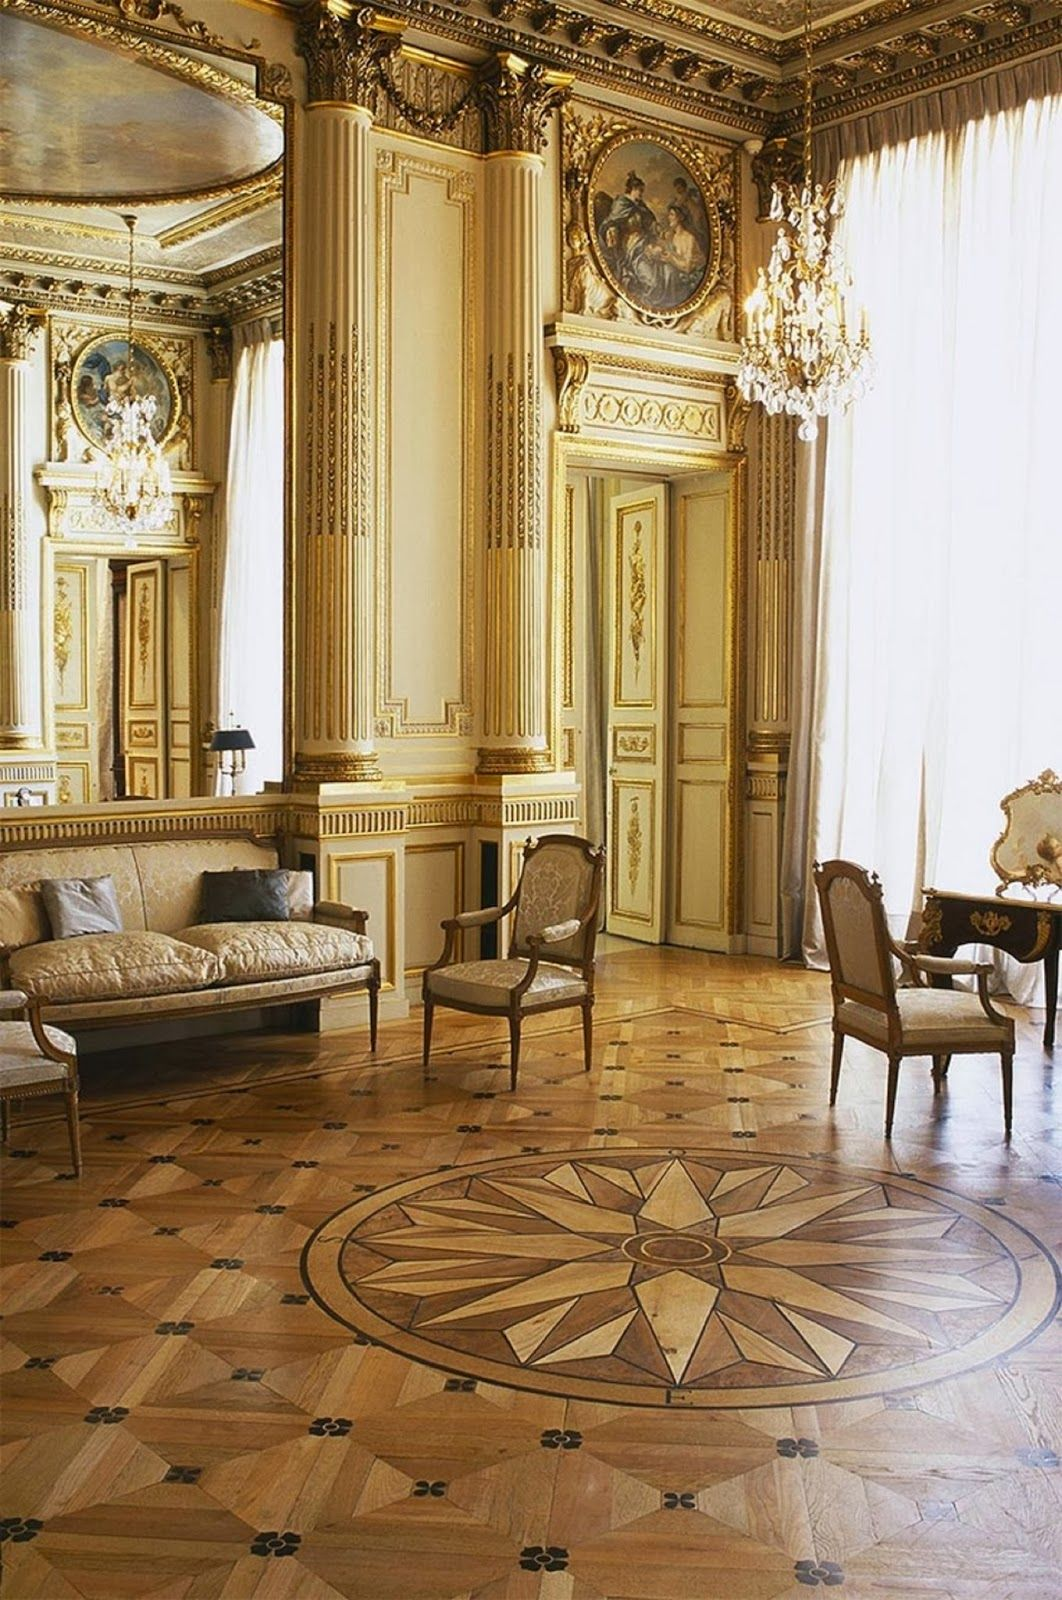 Floor With Inlaid Wood Design Such Craftsmanship Chaumer Priate